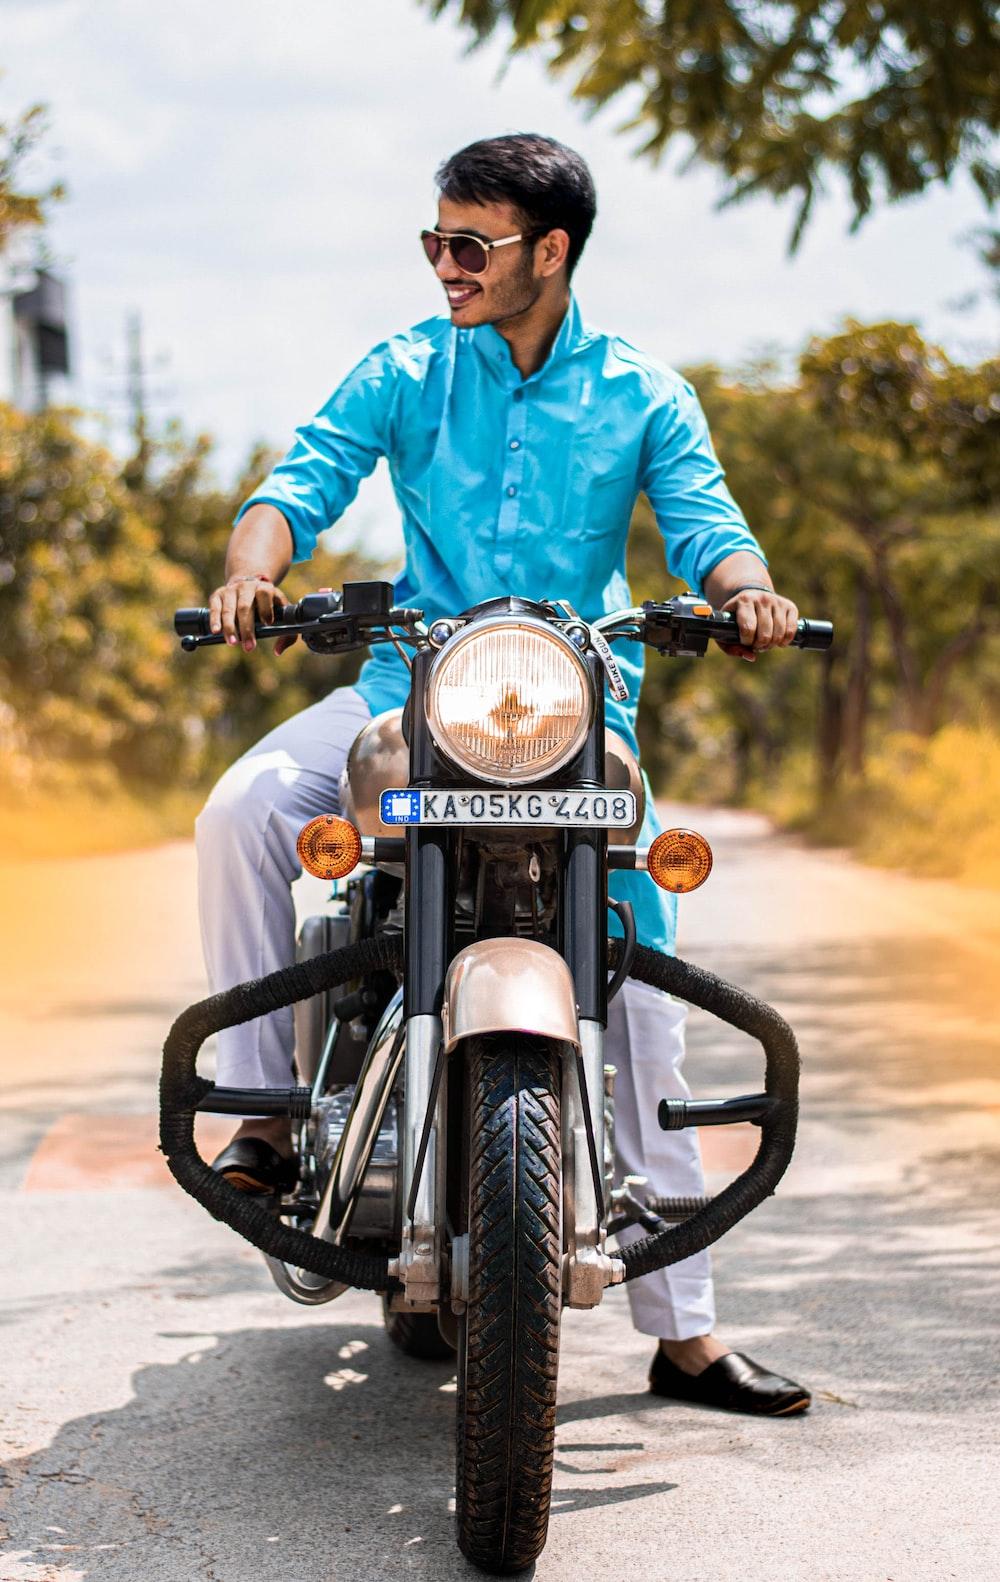 man in blue dress shirt riding motorcycle